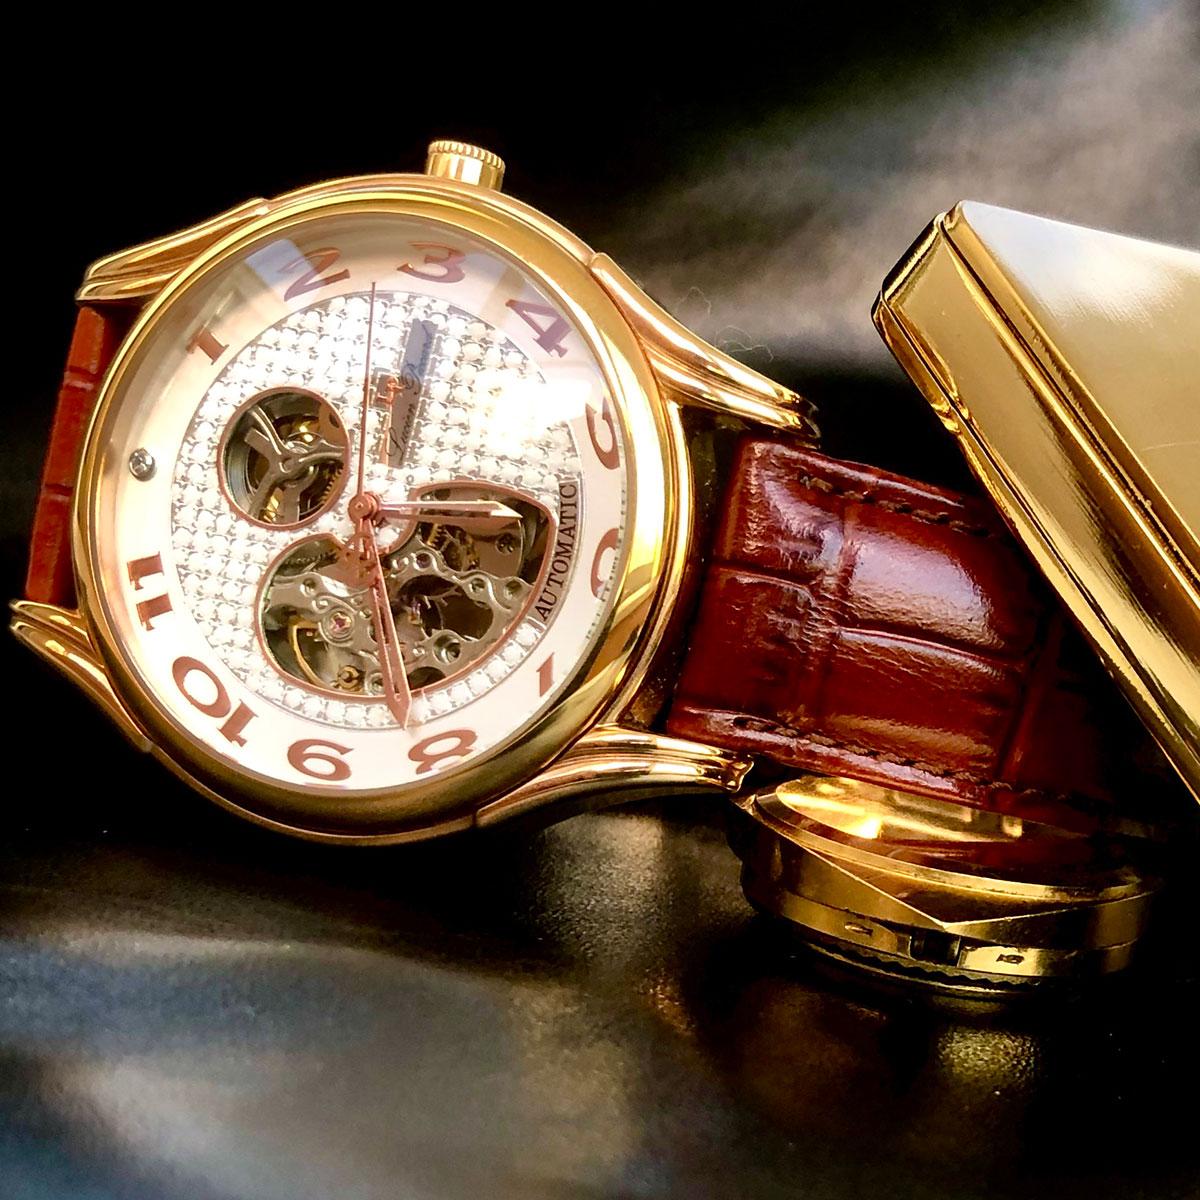 Lucien Piccard. Крах Золотой Империи  #Lucien #piccard #automatic #watch #dresswatches #sportswatches #watchbrands #watchreviews #watches #wristwatch #wristwatches #timepieces #watchfam